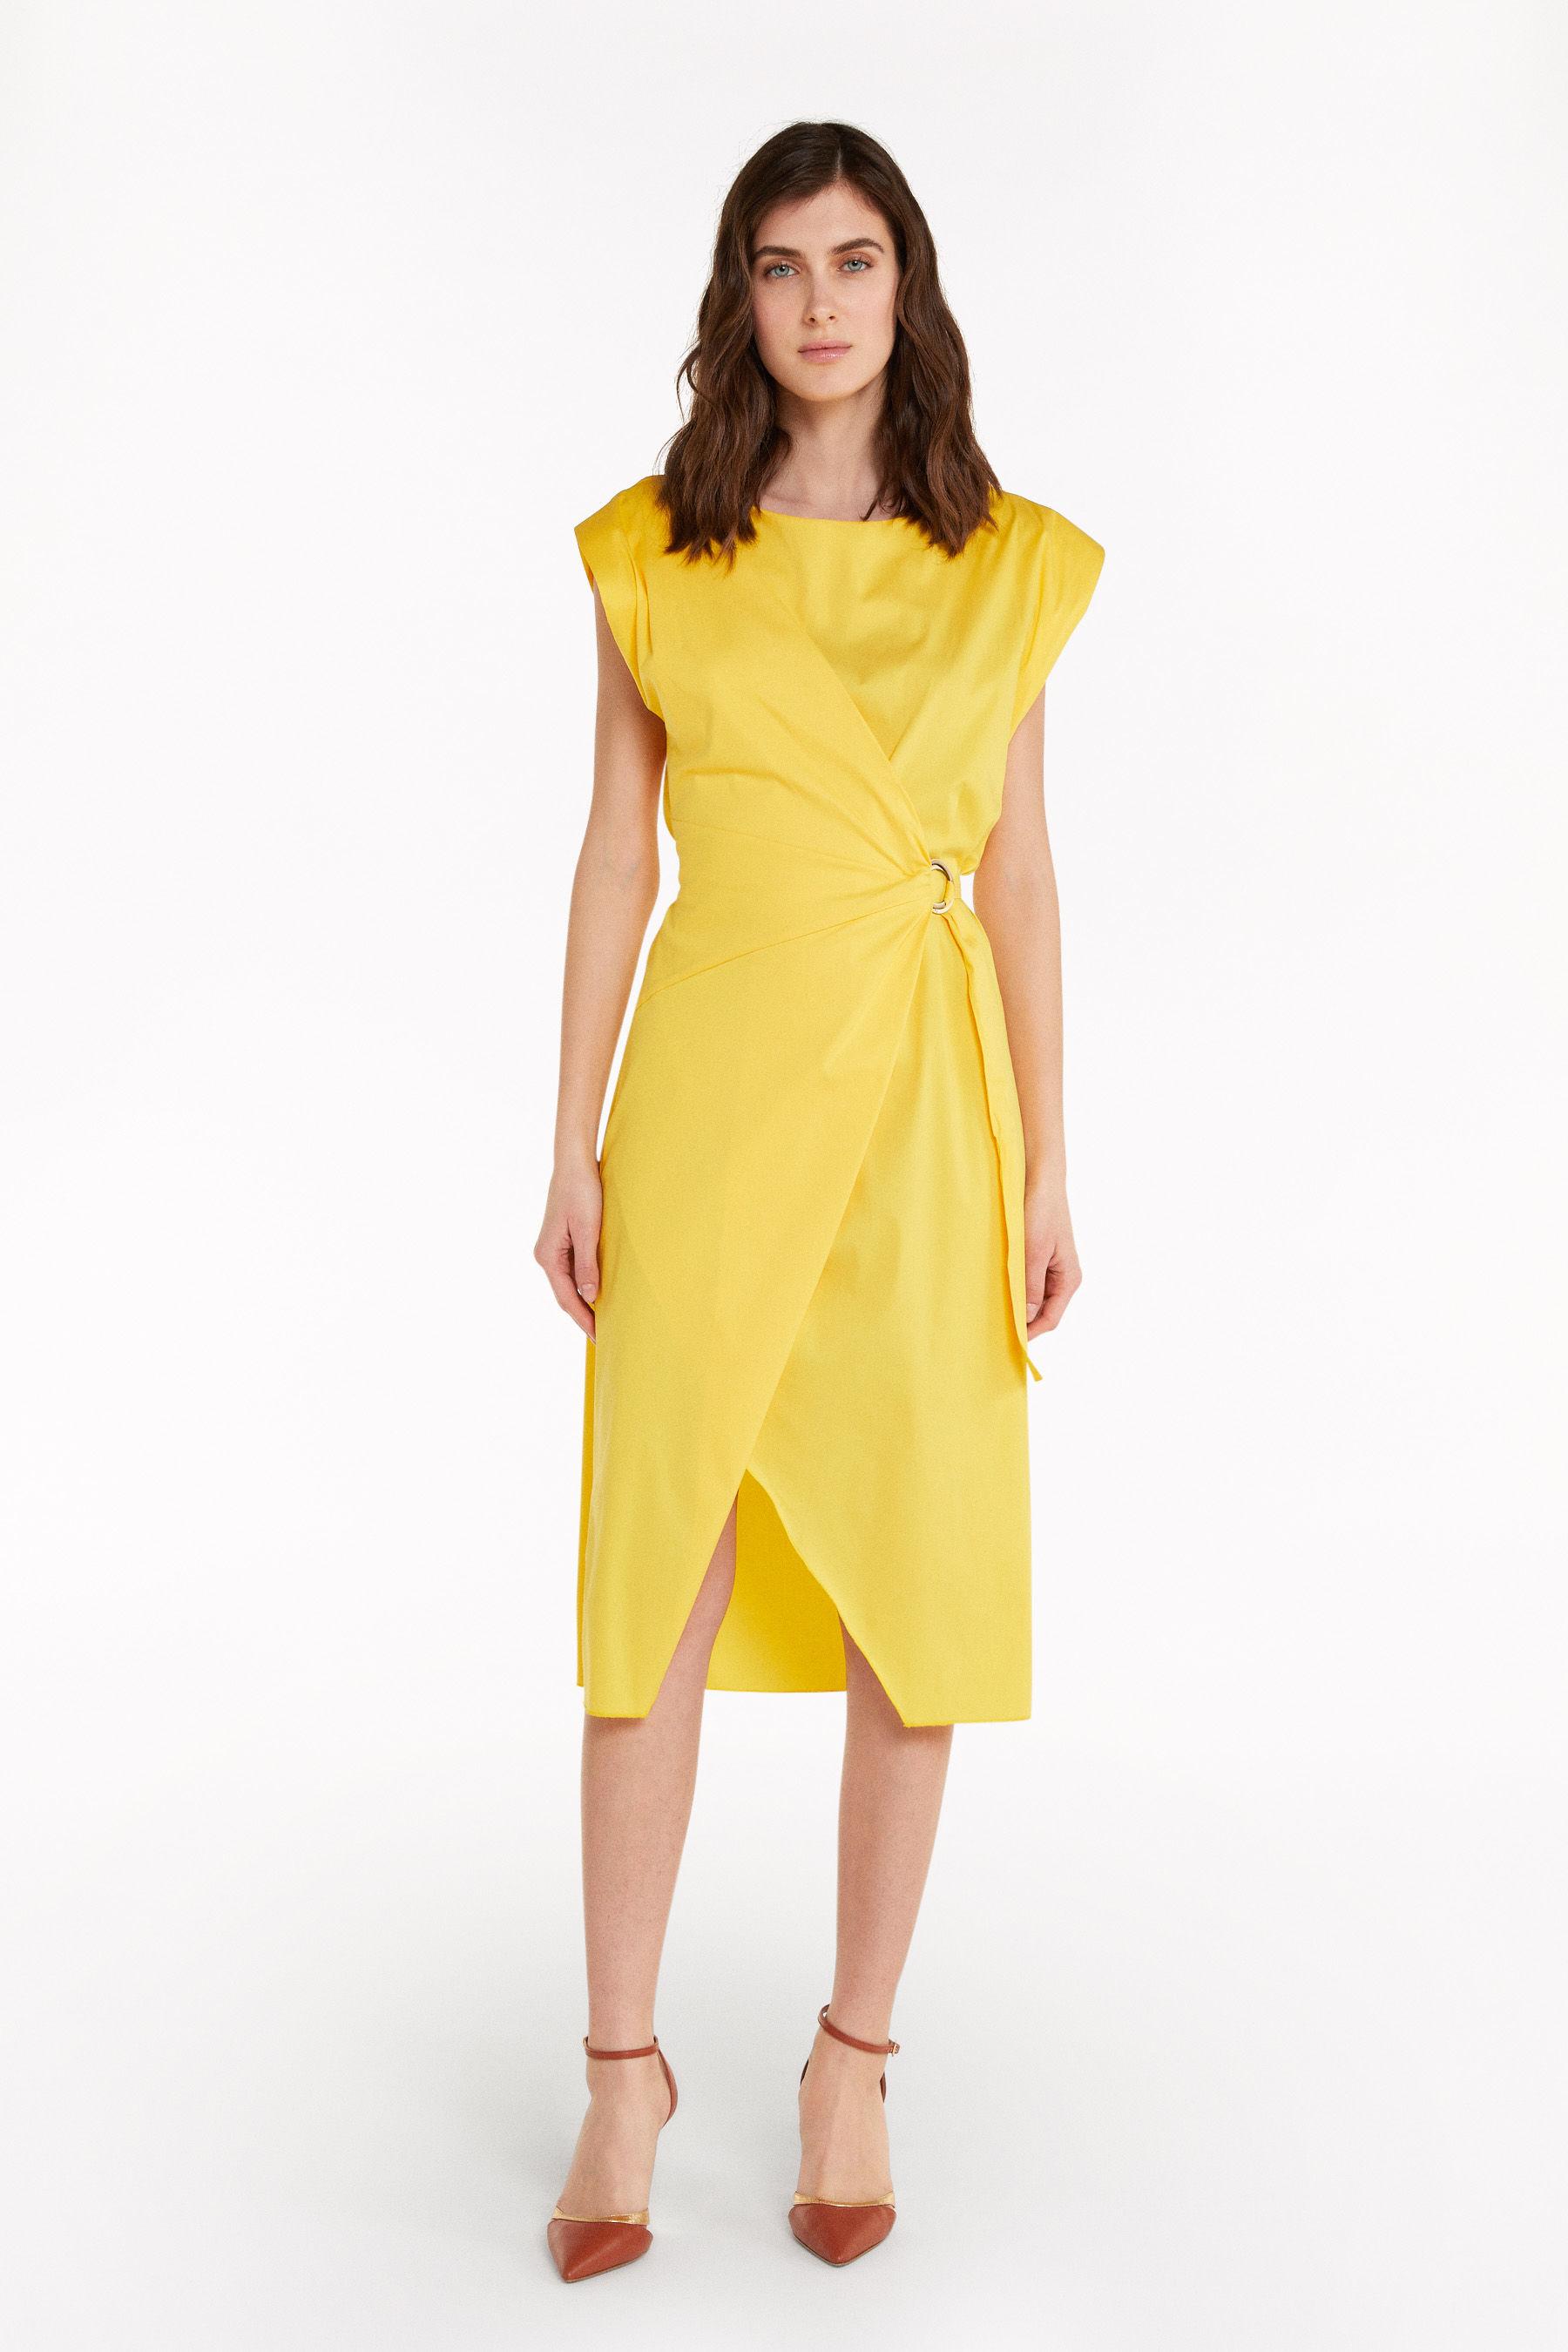 WOMEN/'S SPANISH STYLE SUMMER DRESS SIZE S M LIGHT BROWN,